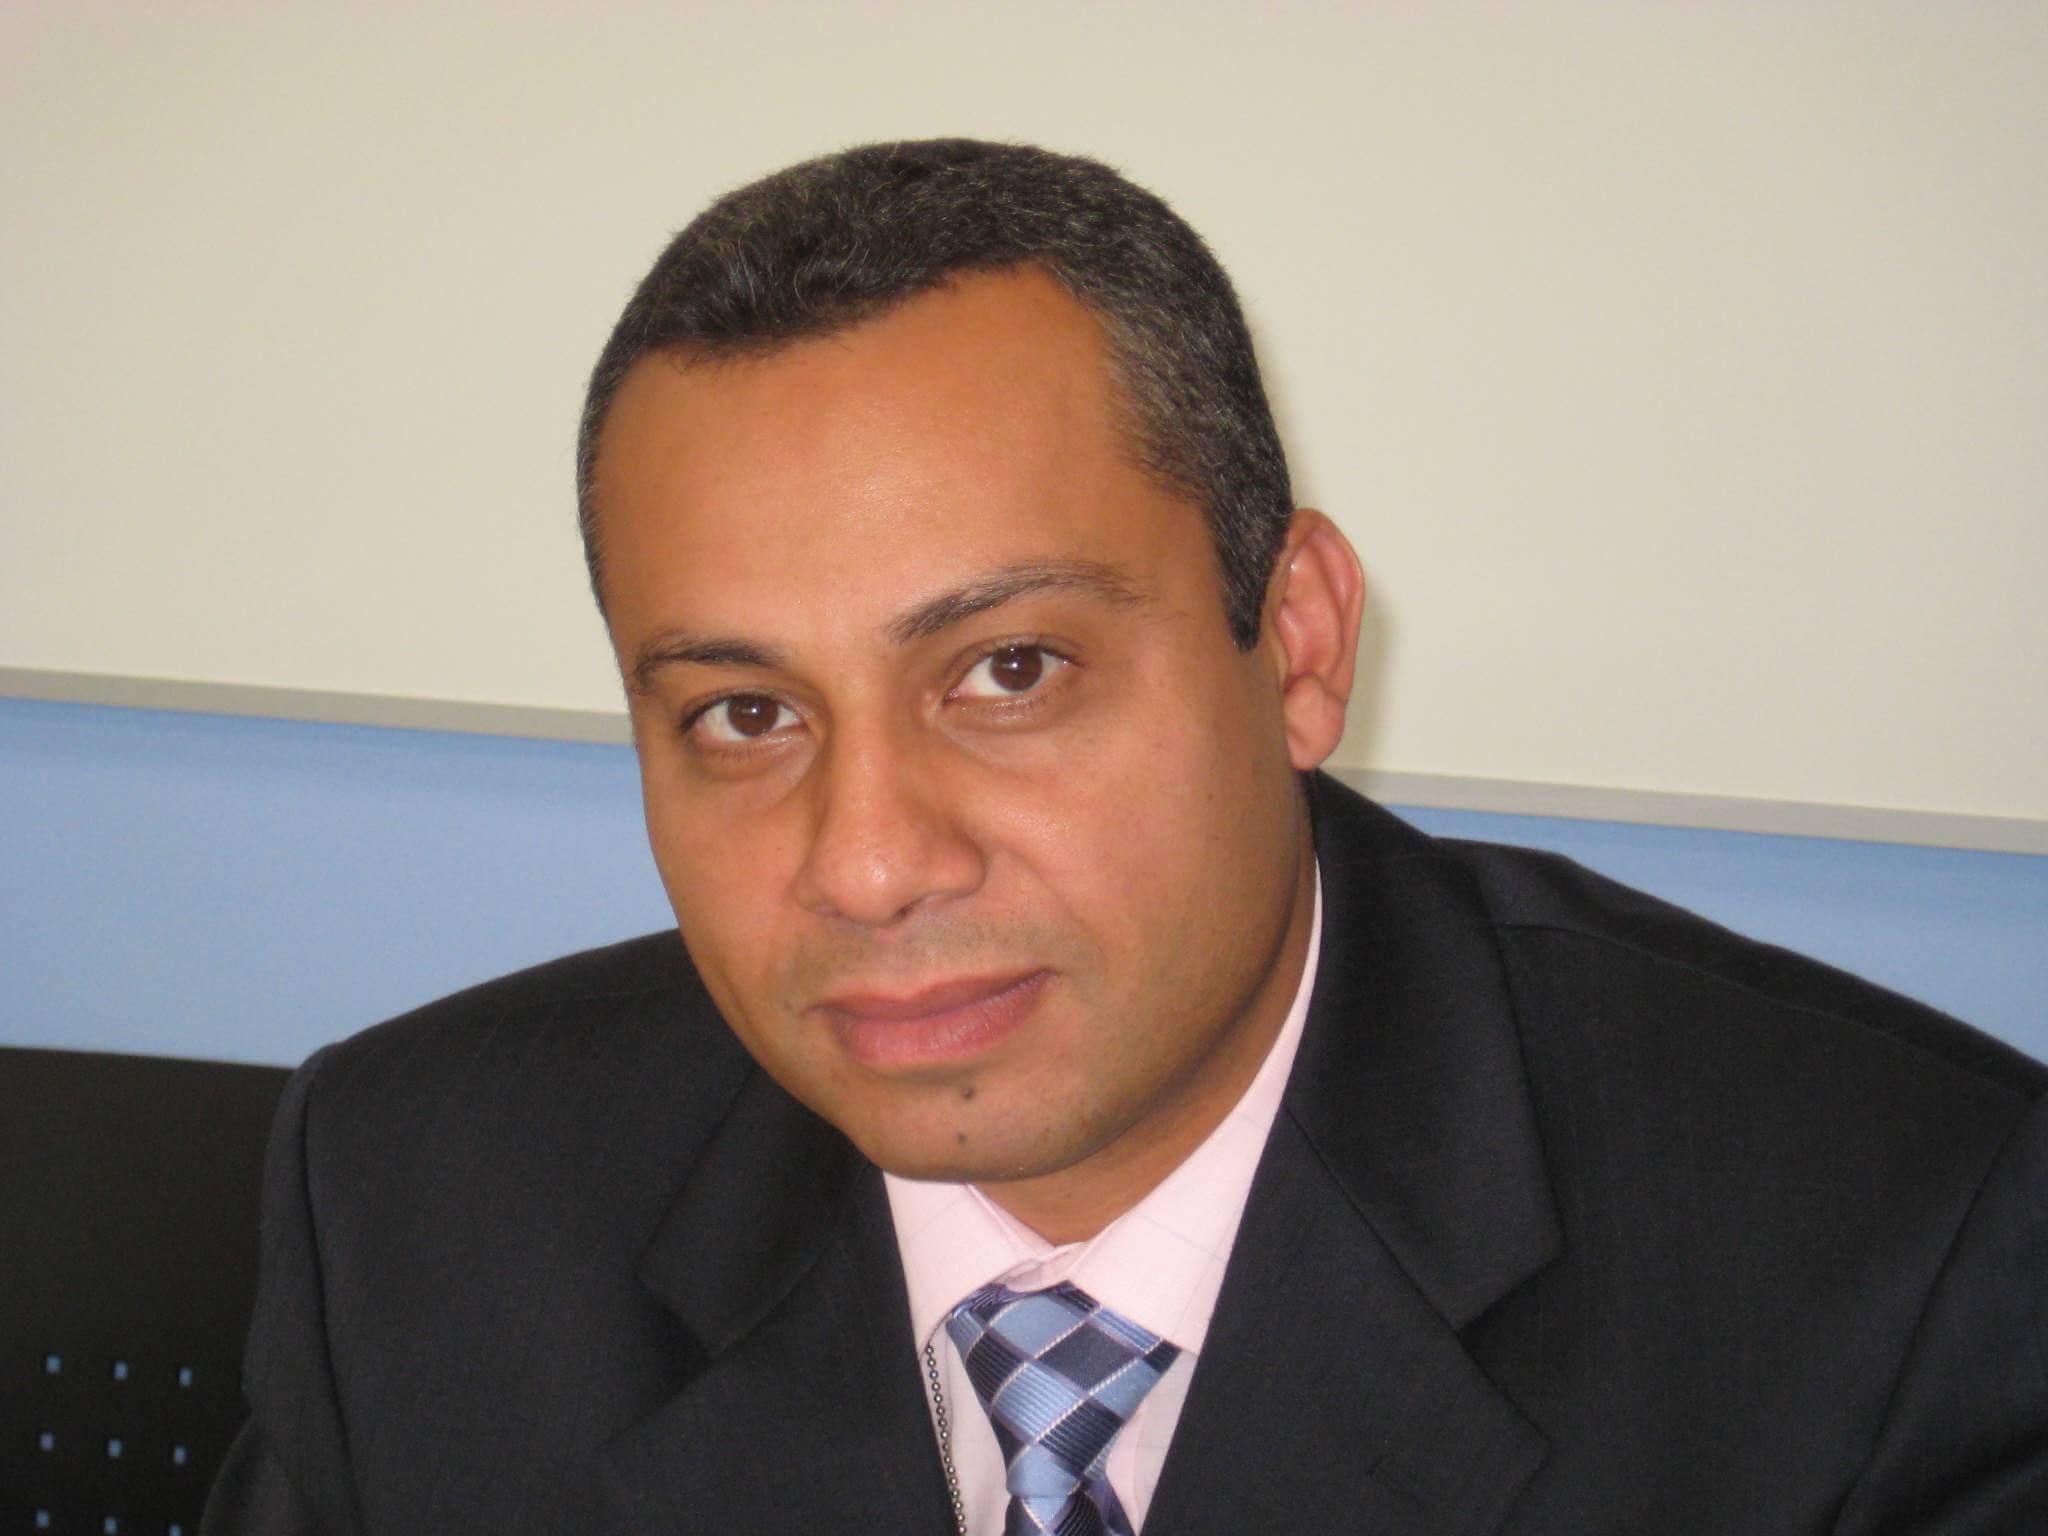 Dr Tarek El-Toukhy